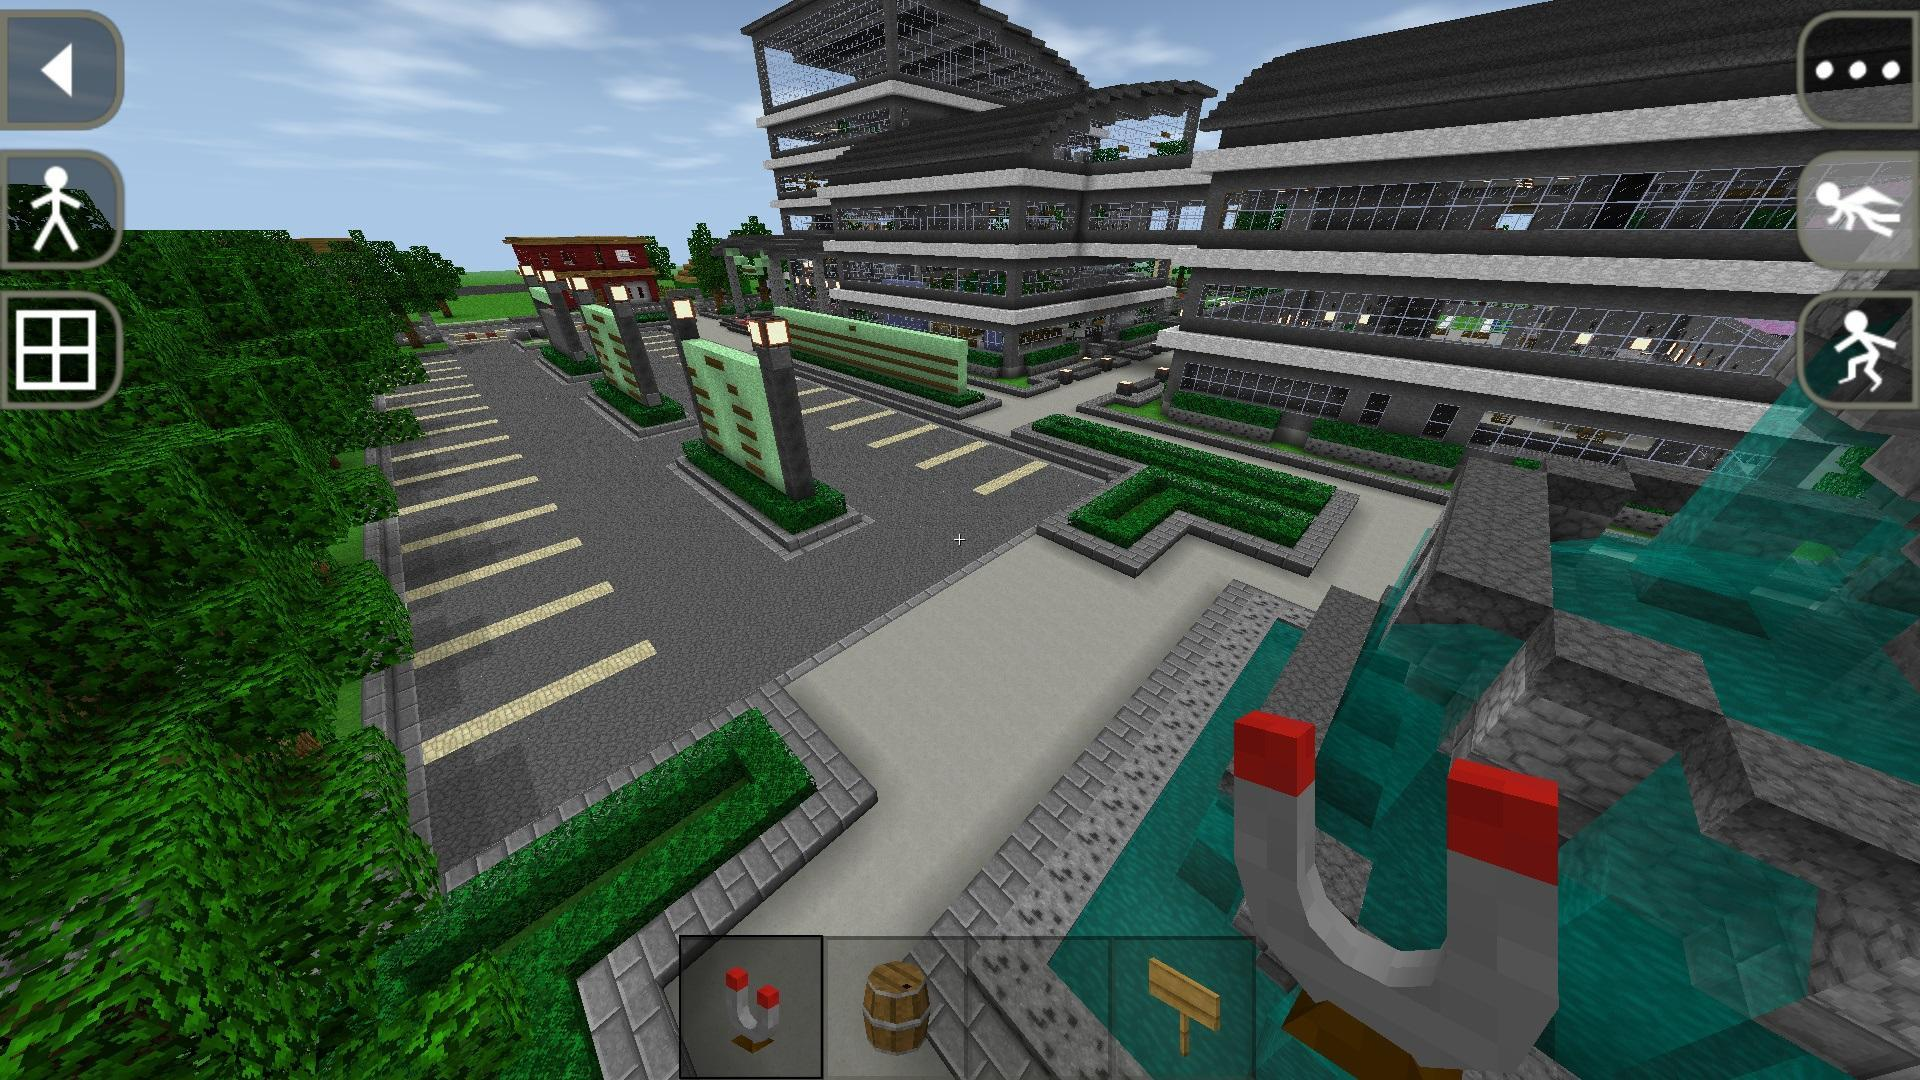 Survivalcraft Demo 1.29.54.0 Screenshot 5